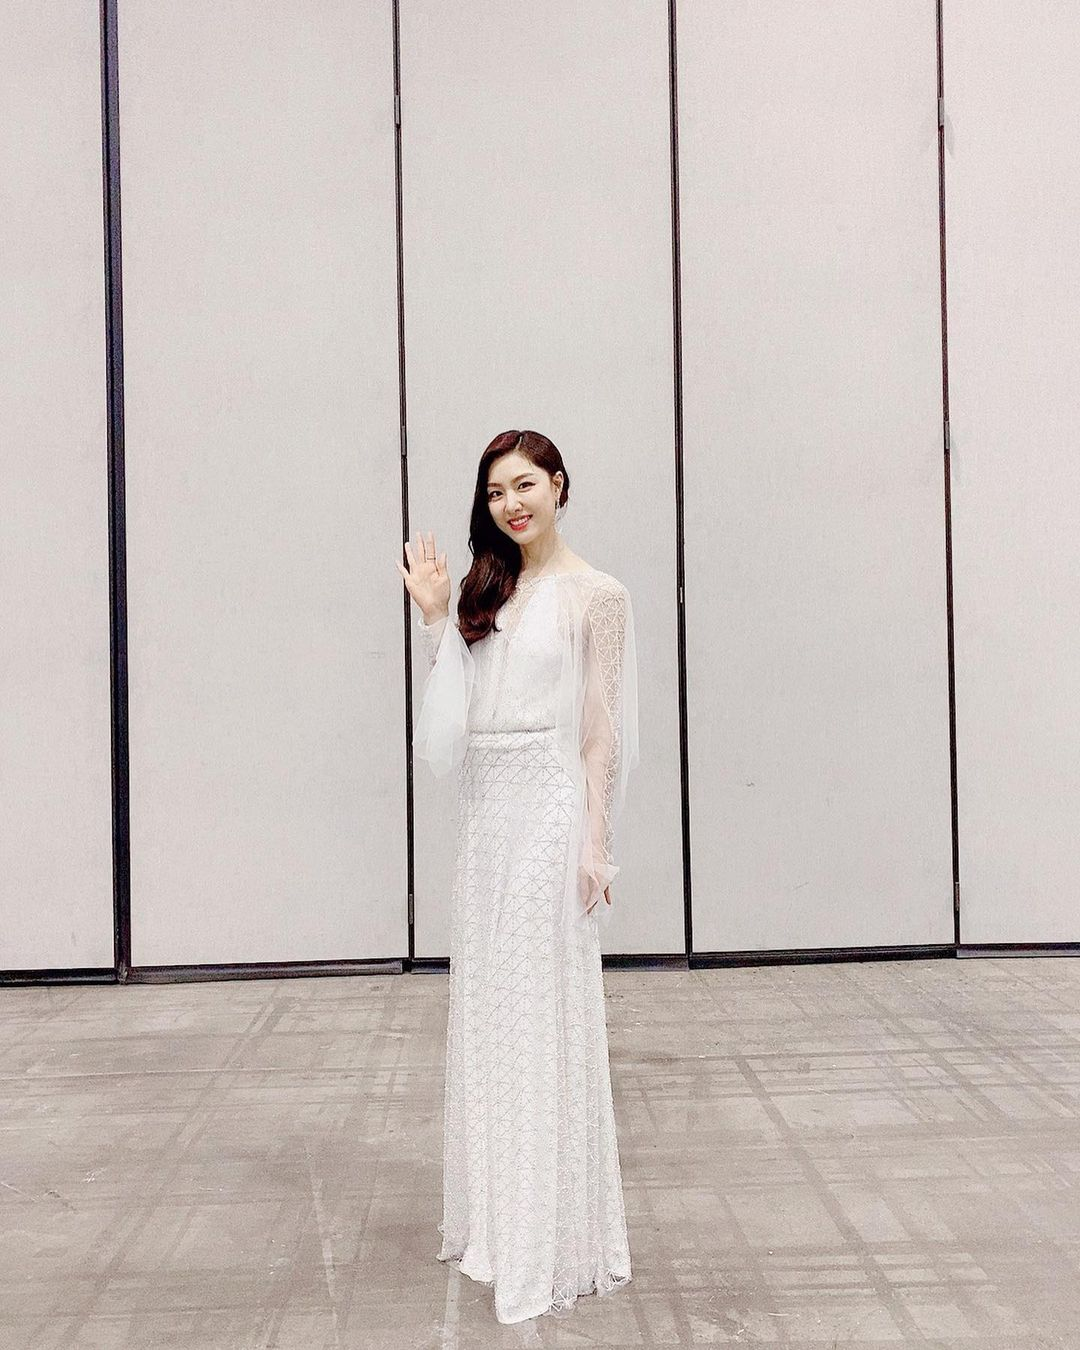 Intip Gaya Seo Ji Hye, Aktris Modis 'Pacar Baru' Kim Jung Hyun